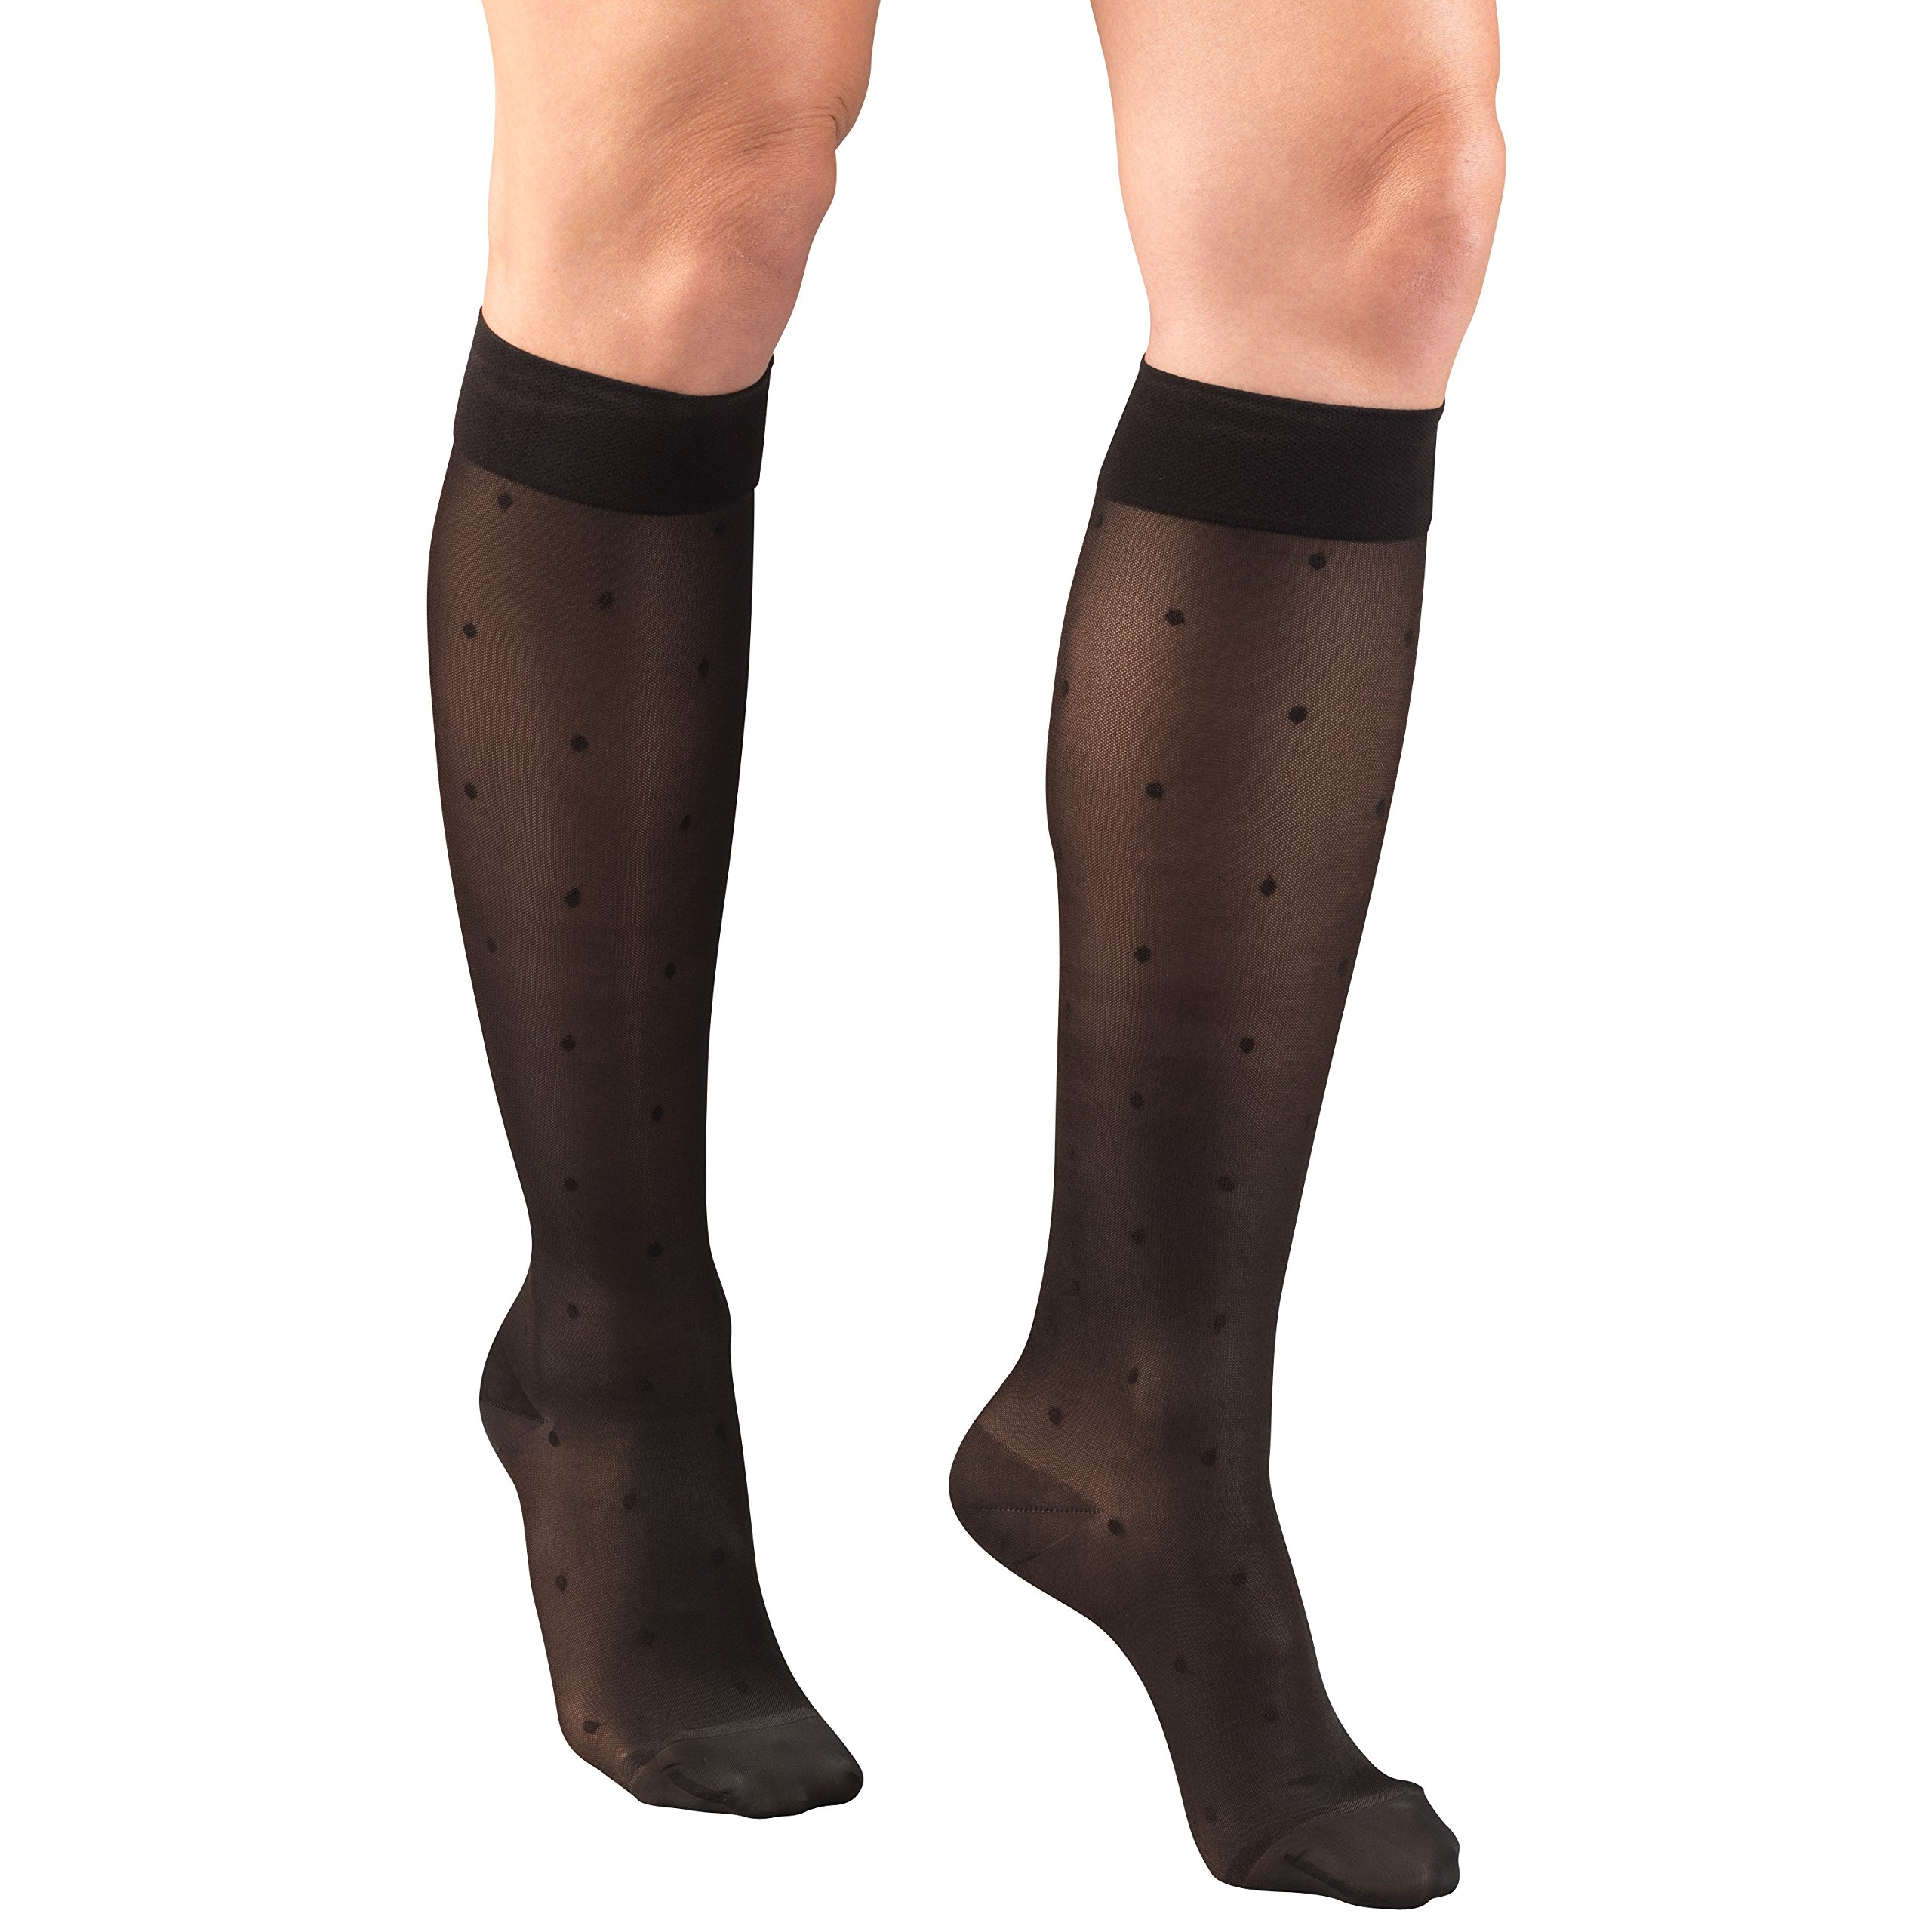 Truform Sheer Compression Stockings, 15-20